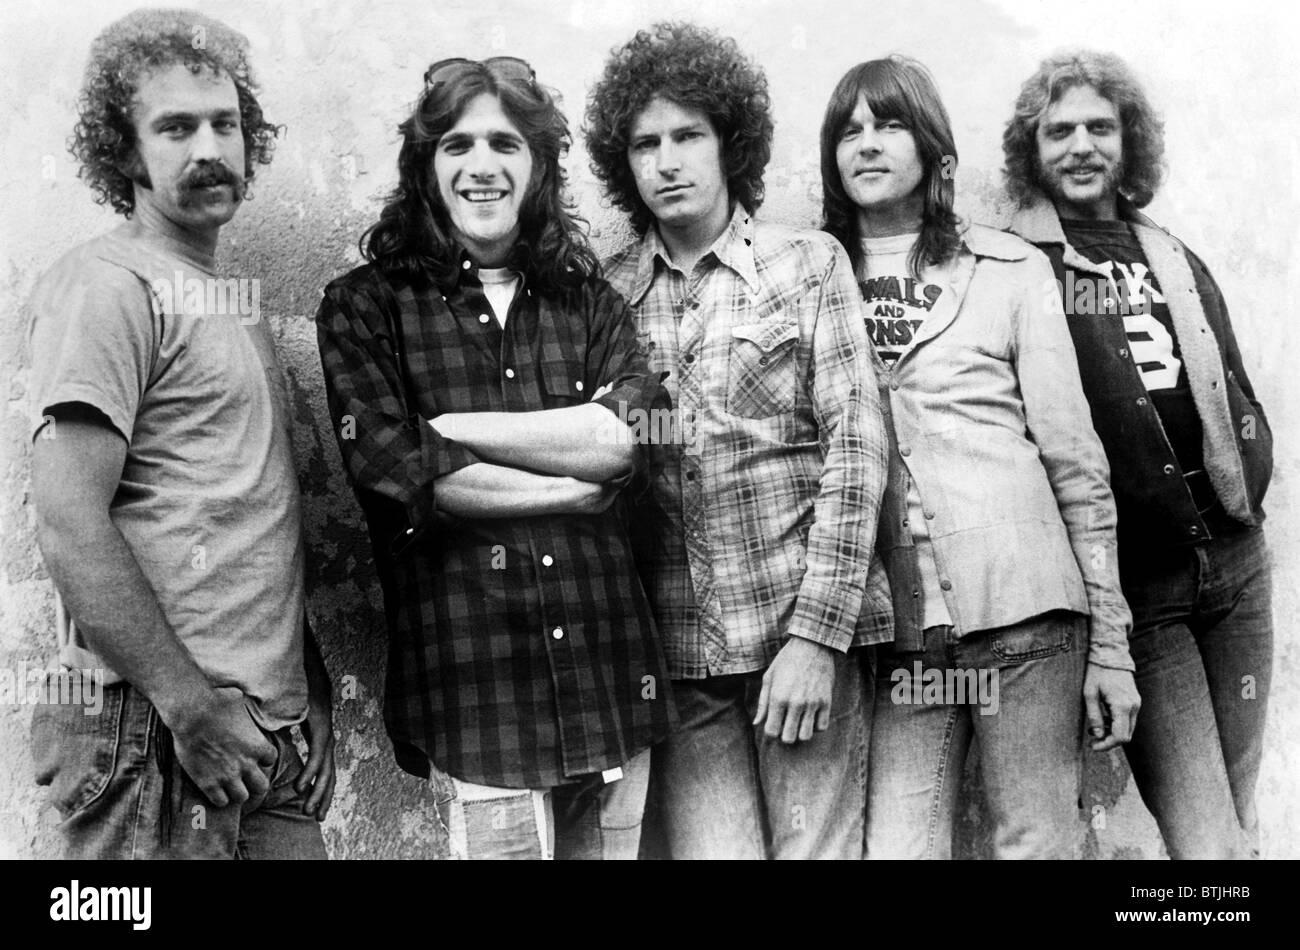 The Eagles, l to r: Bernie Leadon, Glenn Frey, Don Henley, Randy Meisner, Don Felder, ca. early 1970s. Courtesy: - Stock Image